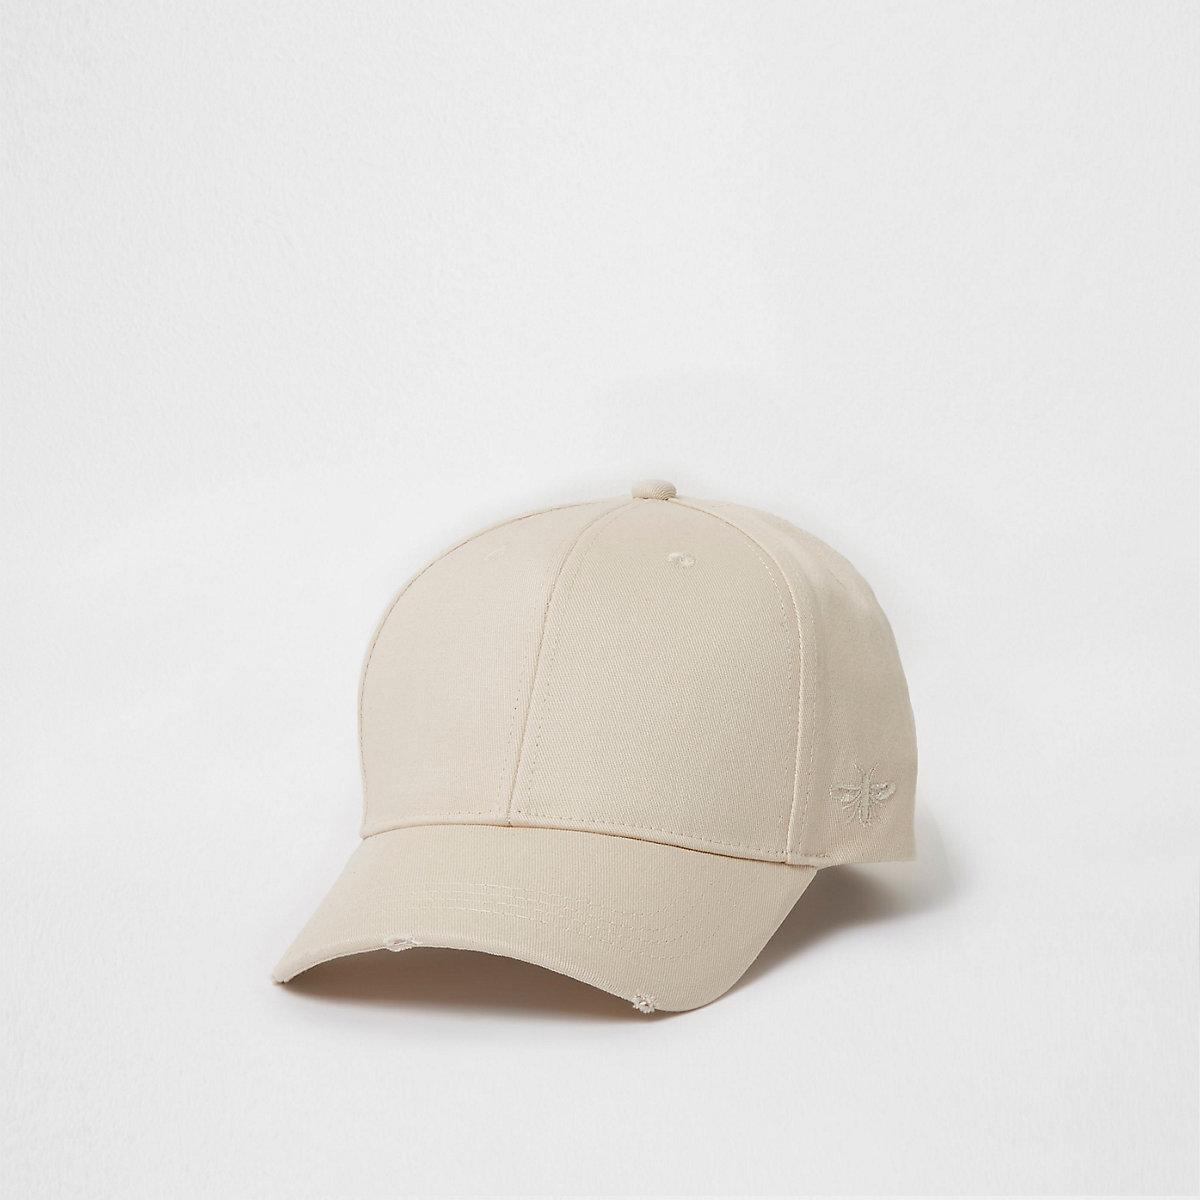 Cream wasp embroidered baseball cap